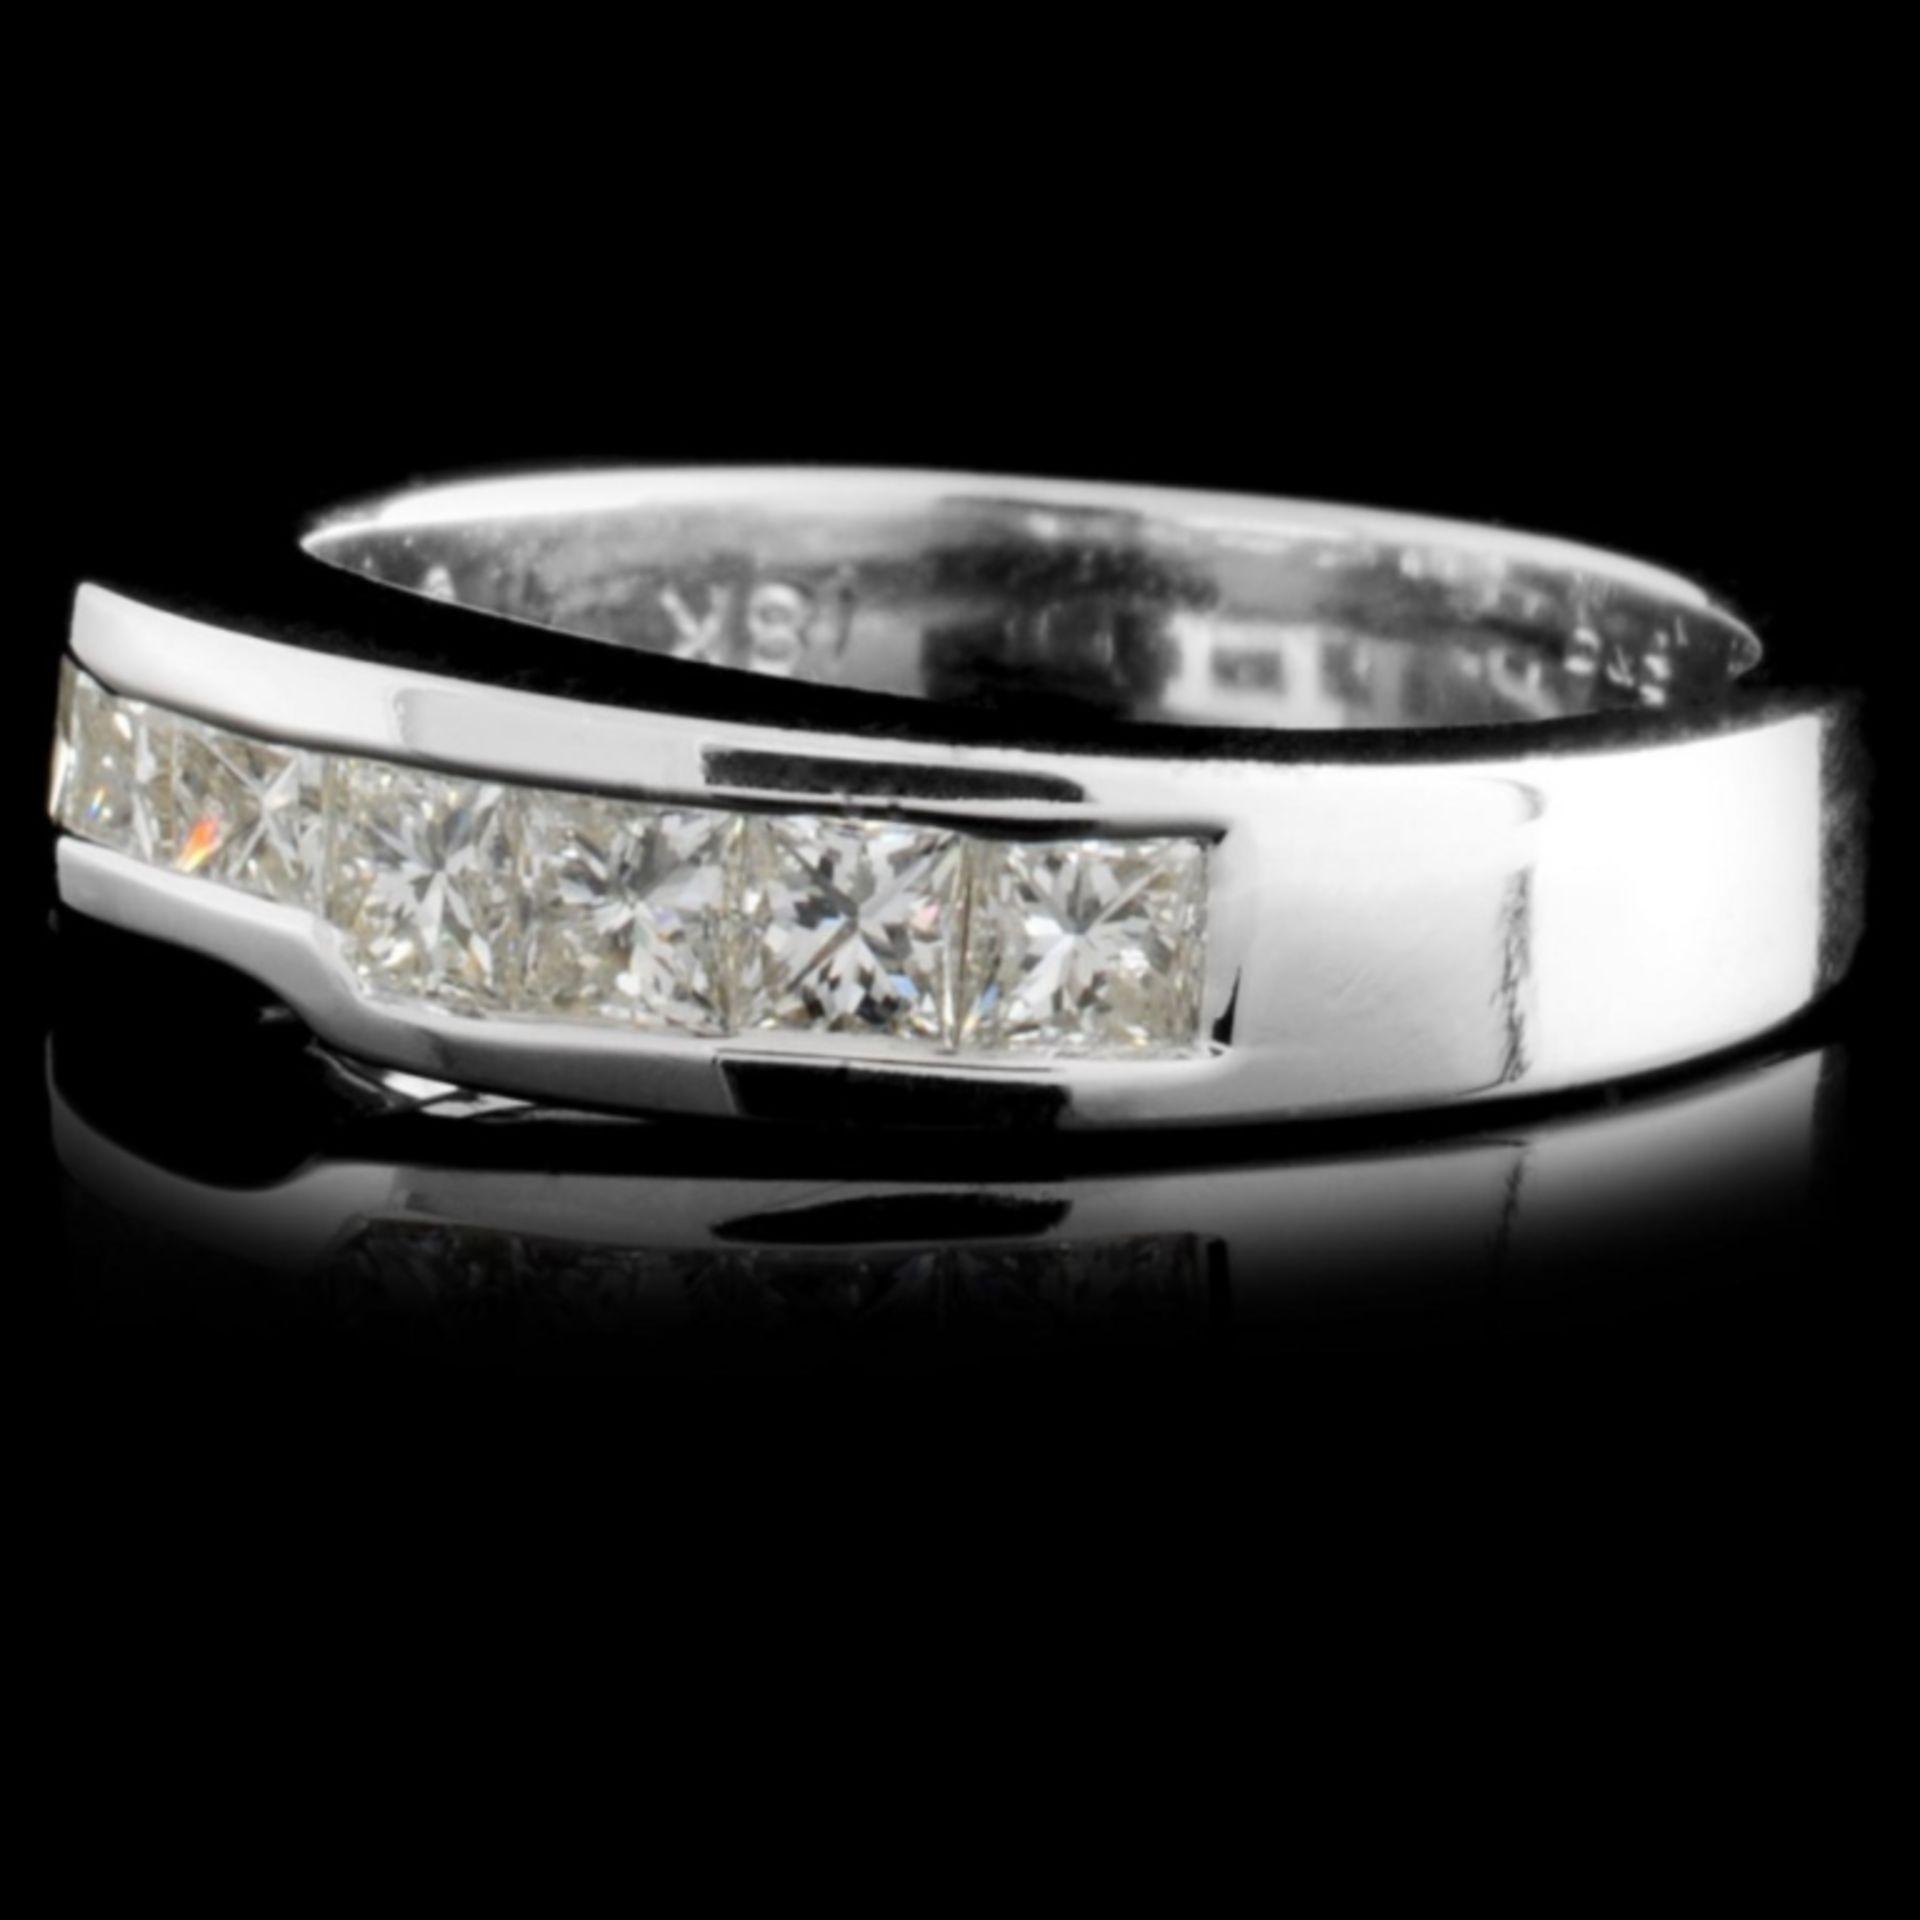 18K White Gold 0.71ctw Diamond Ring - Image 2 of 3